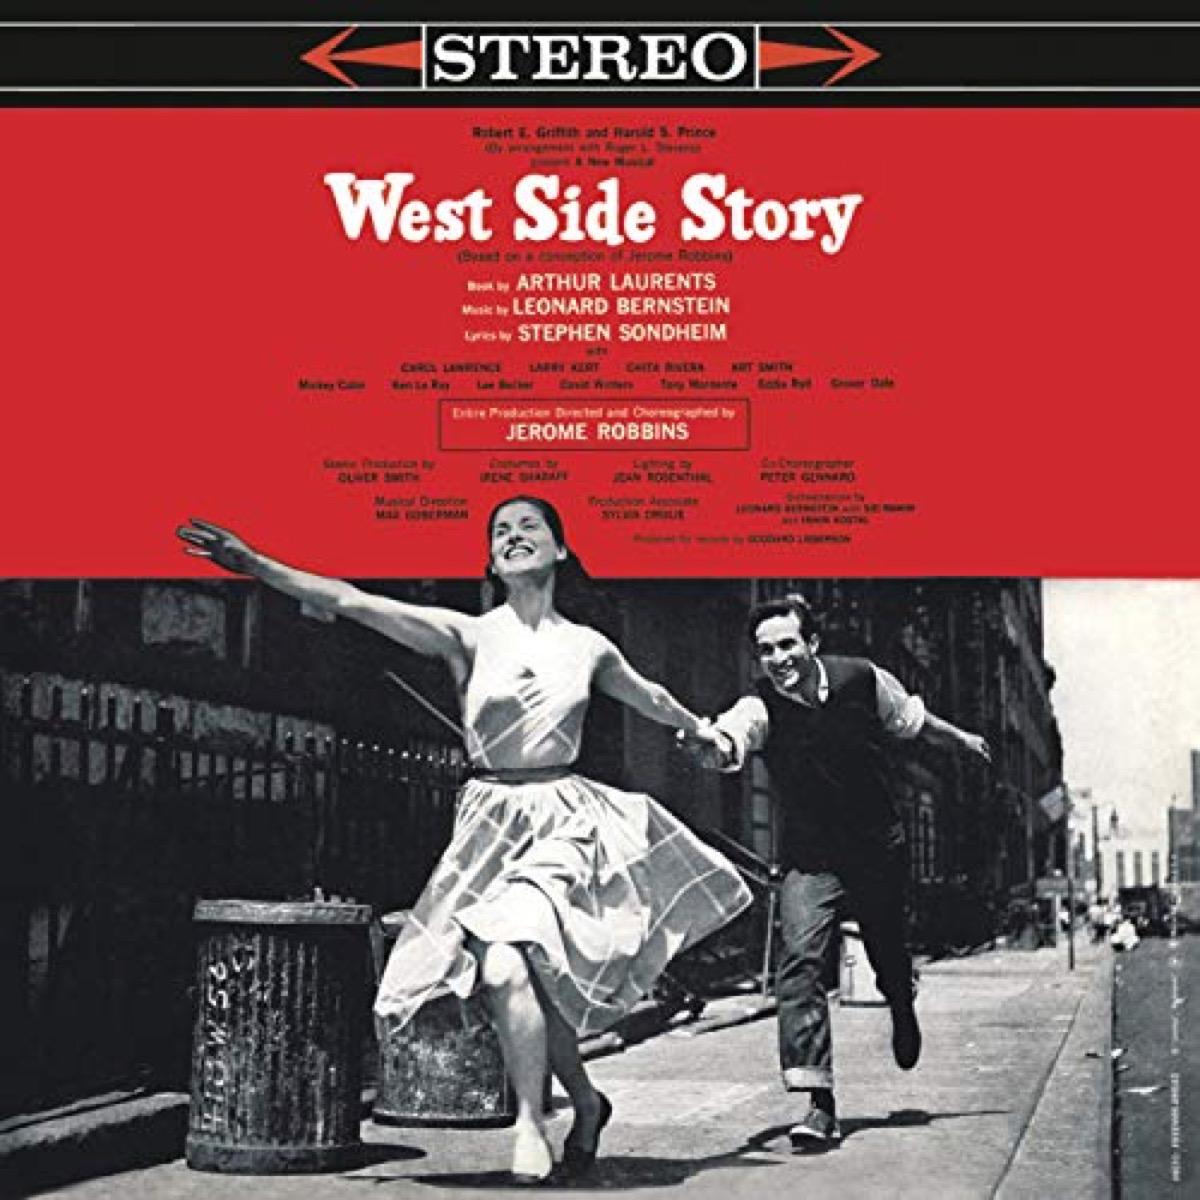 west side story original broadway cast recording